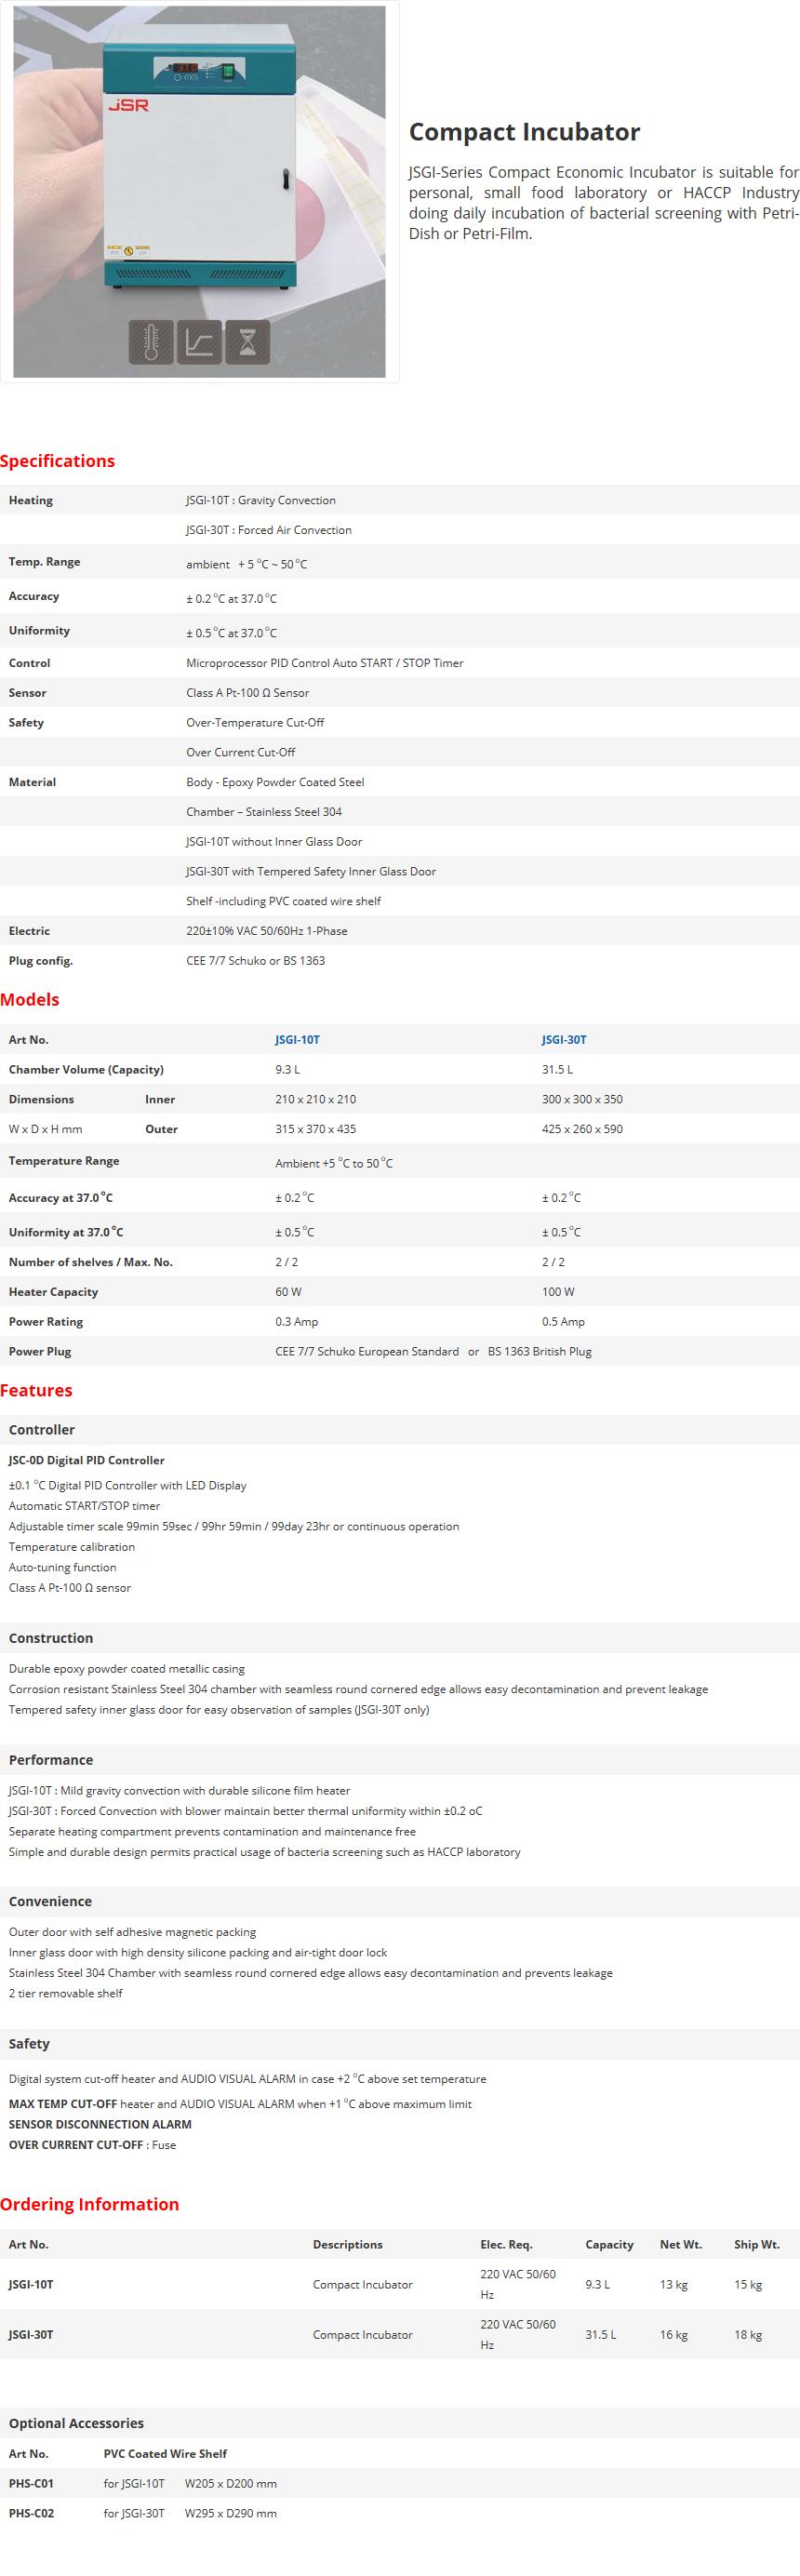 JS Research Compact Incubator JSGI-10T/30T